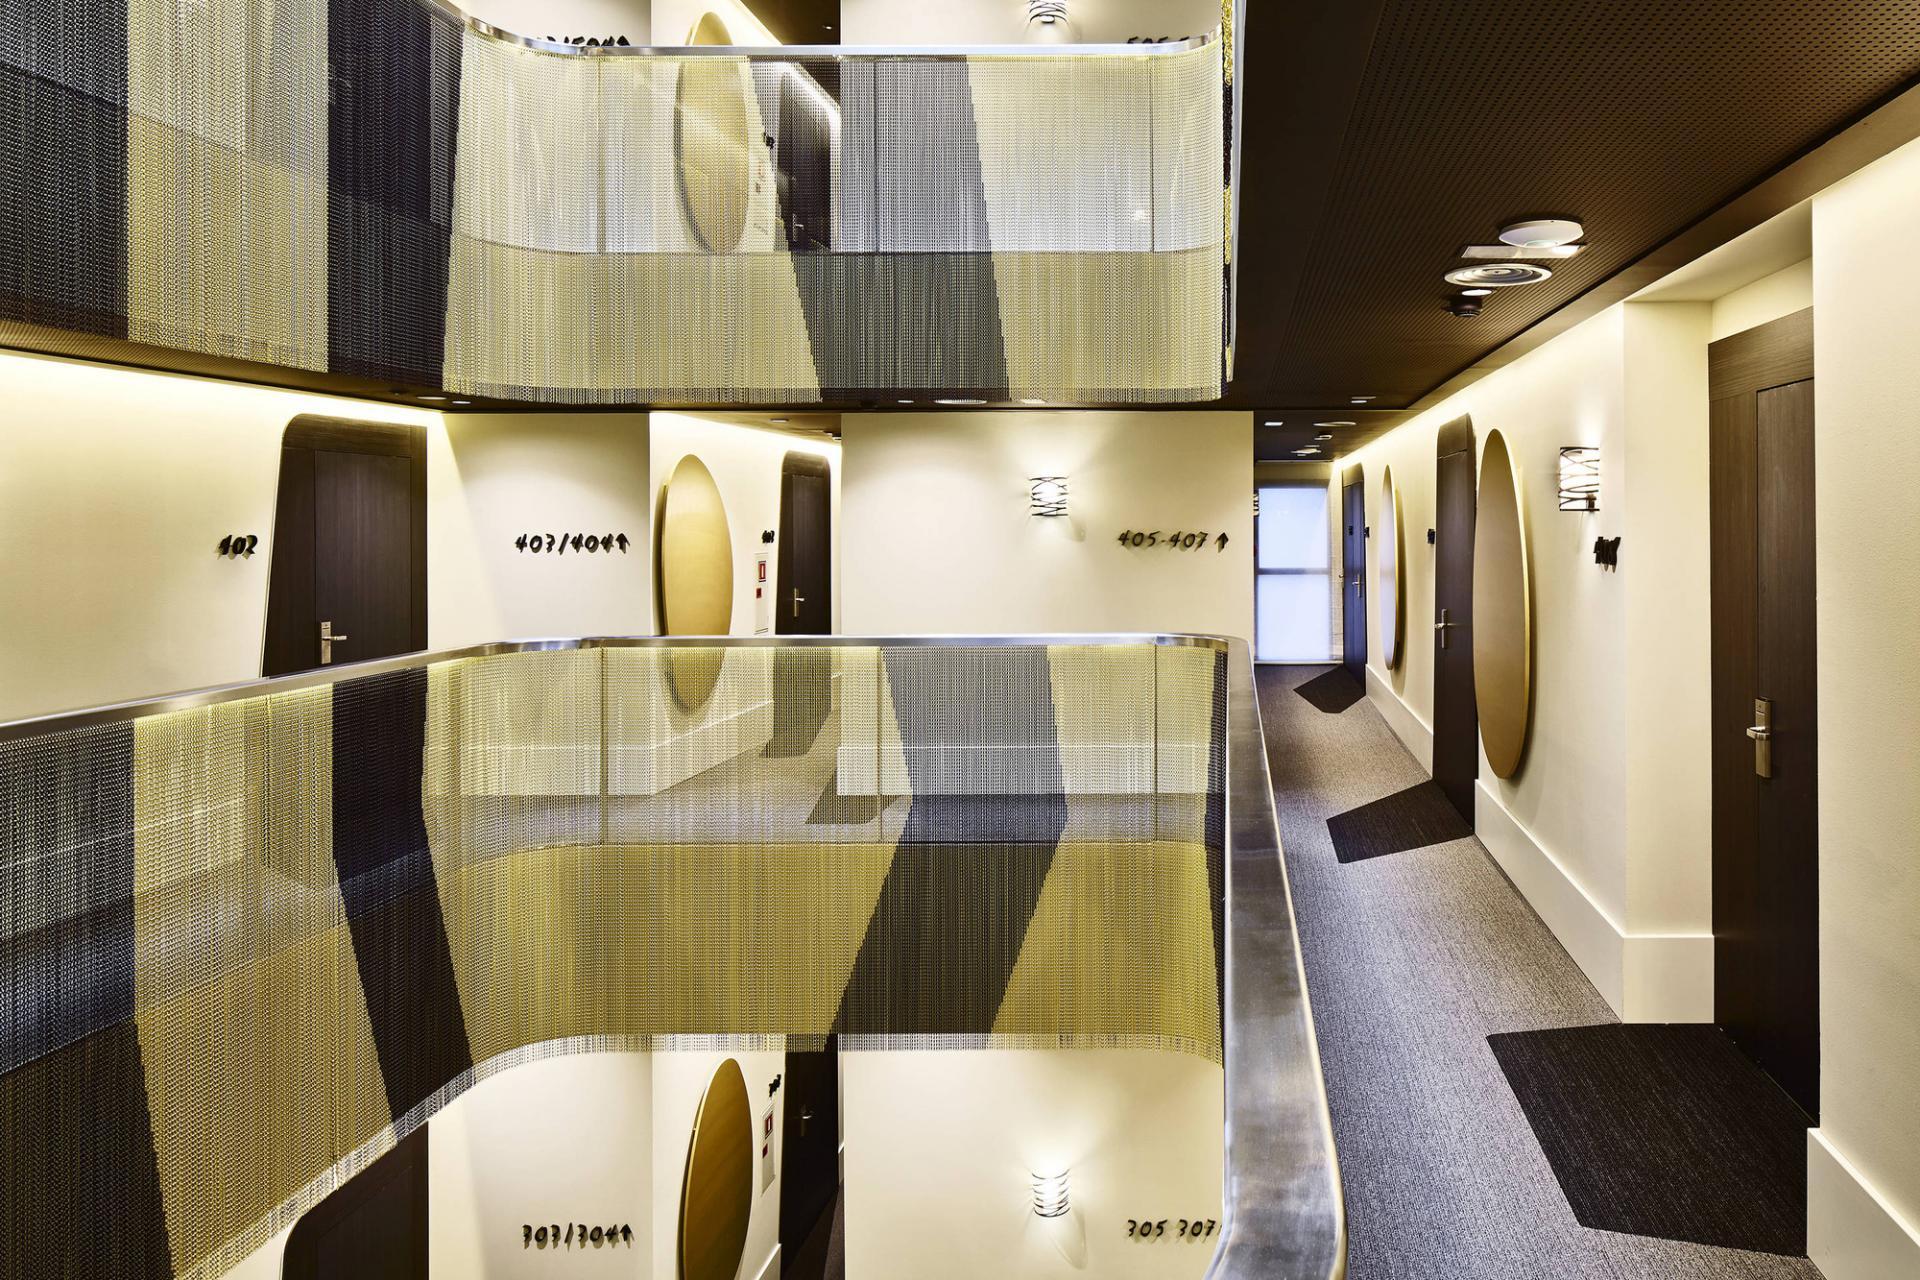 the vincci gala hotel in barcelona archiscene your daily architecture design update. Black Bedroom Furniture Sets. Home Design Ideas